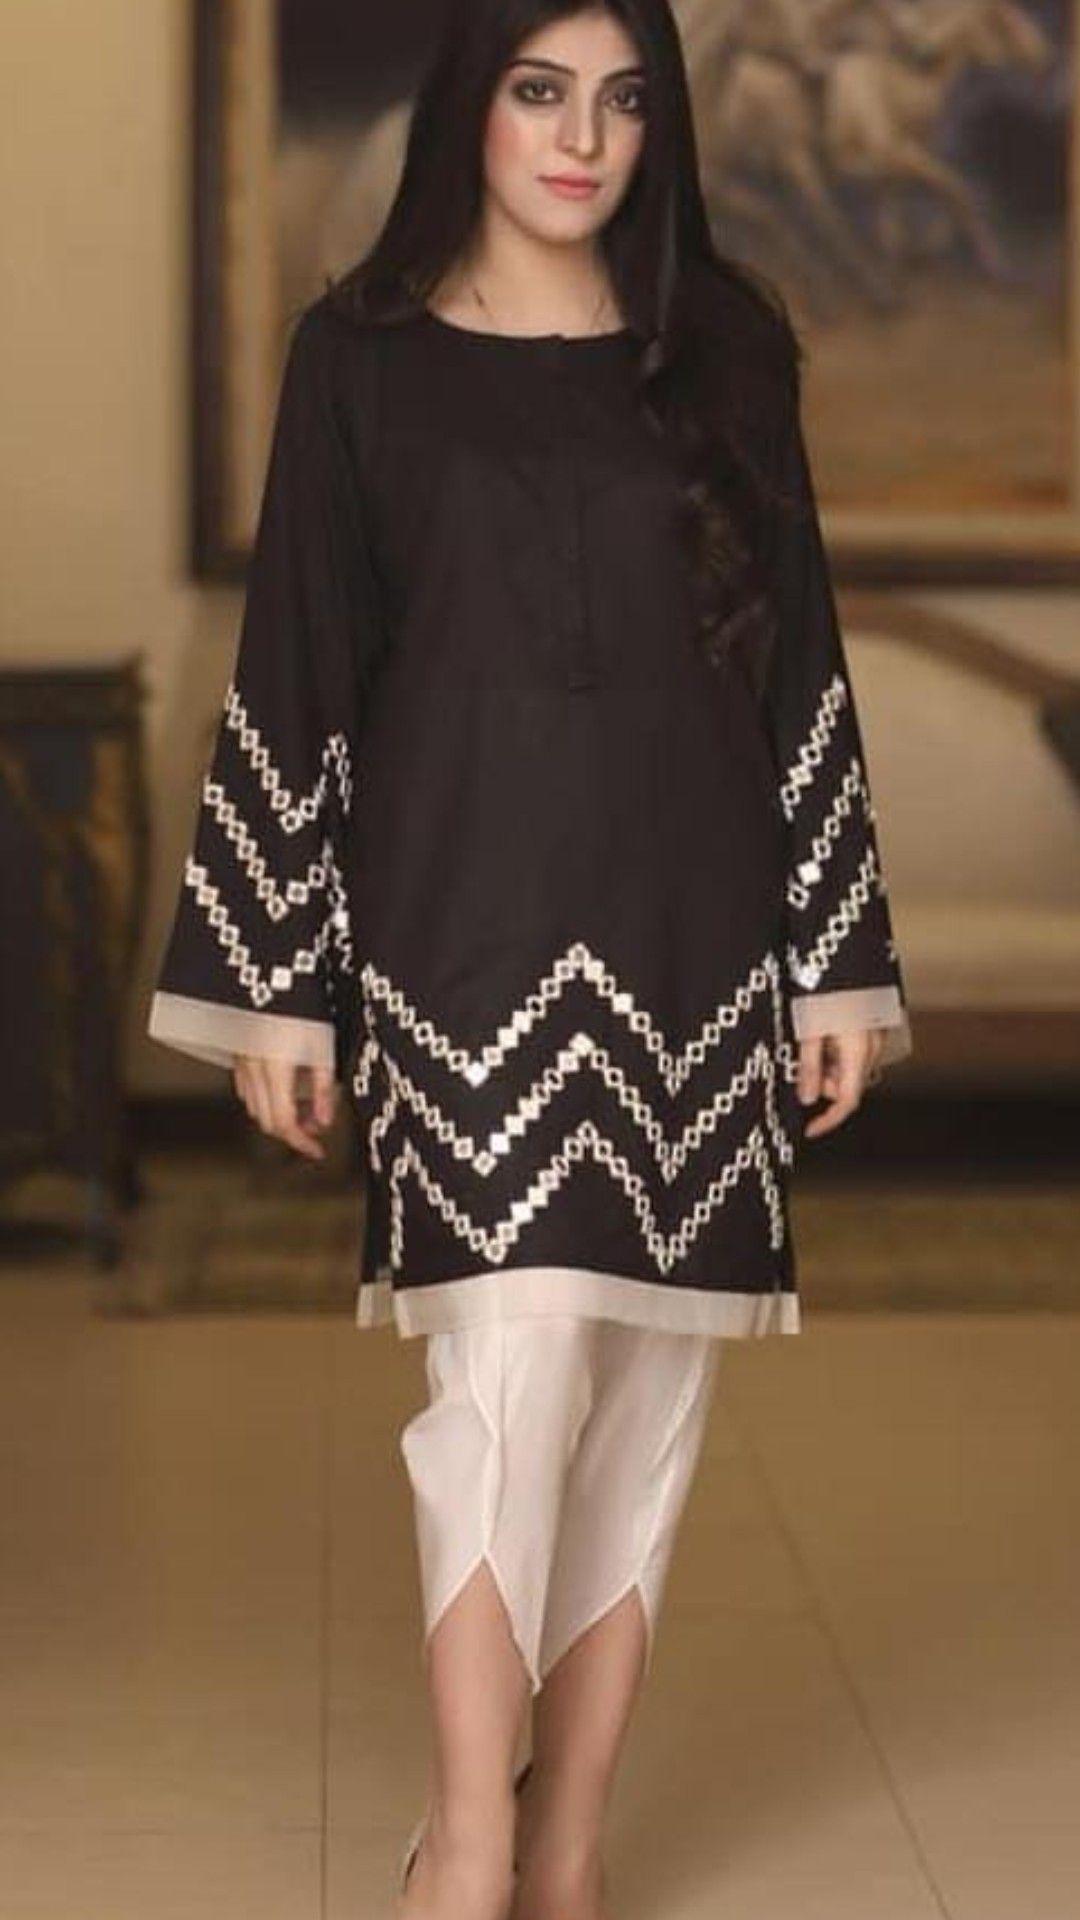 Indiandesignerwear Indiandesignerwear Indiandesignerwear Indiandesignerwear In 2020 Pakistani Dresses Casual Simple Pakistani Dresses Frock Fashion